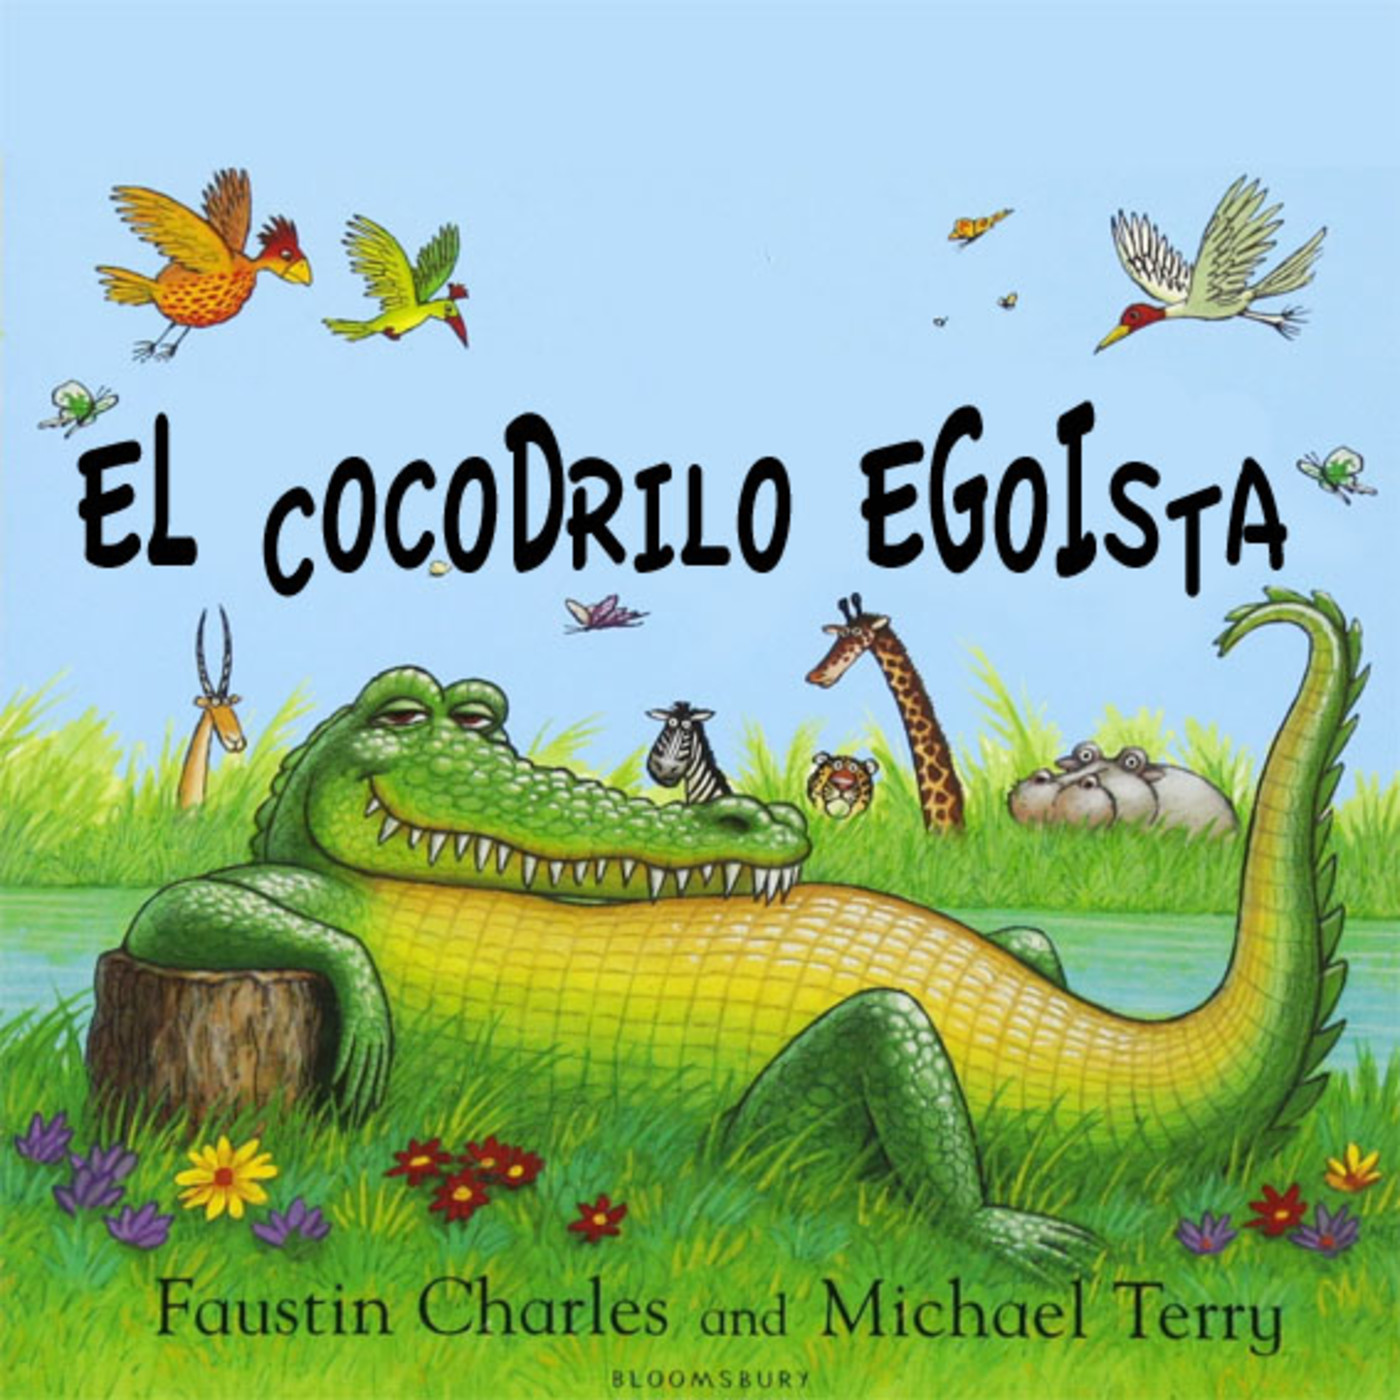 El cocodrilo egoísta. Faustin Charles